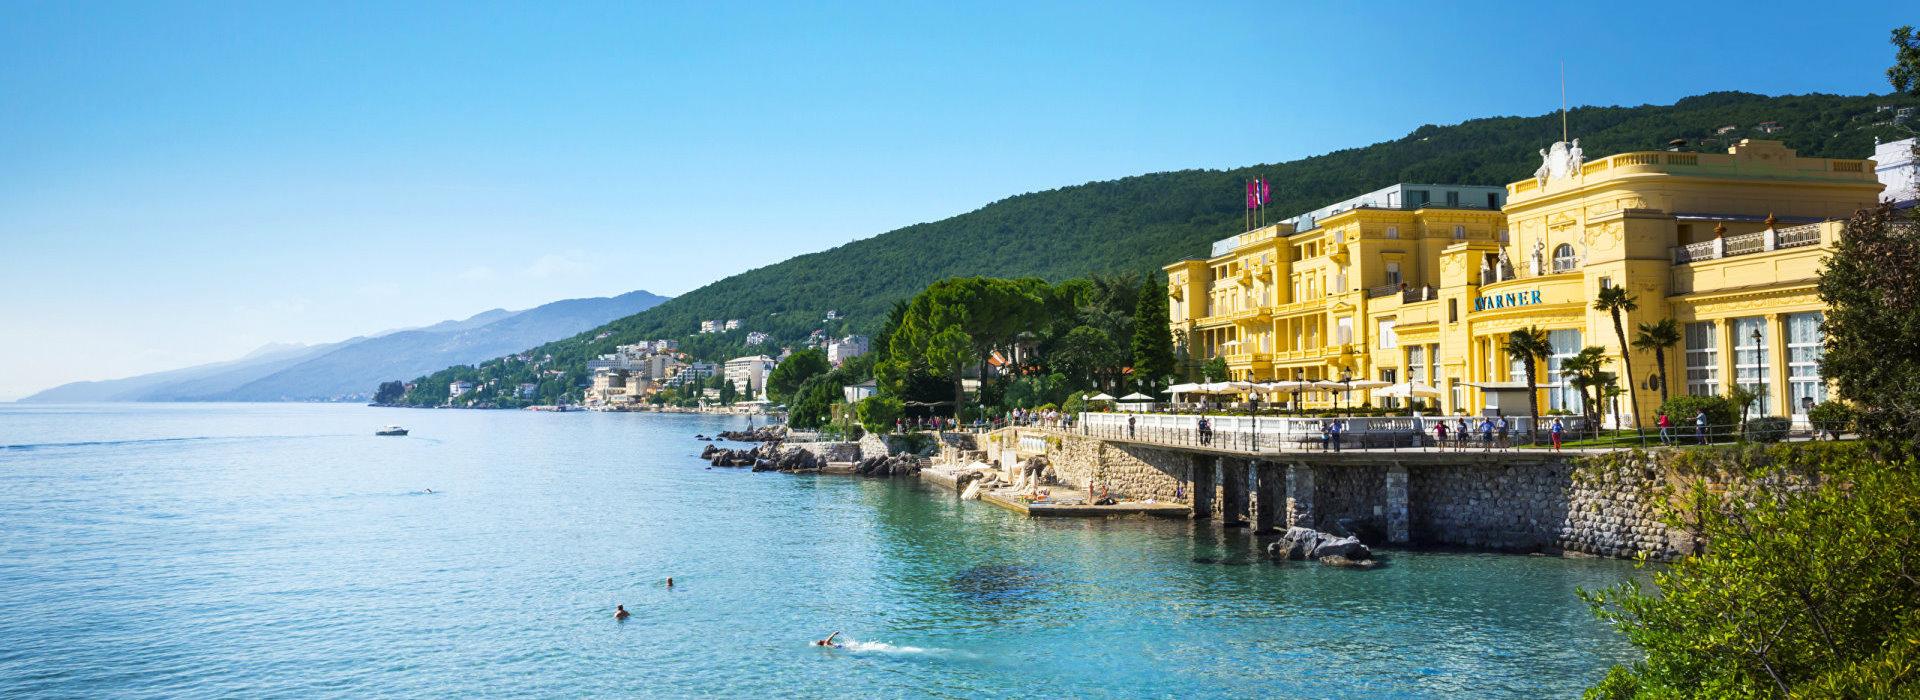 Your holiday dream Opatija